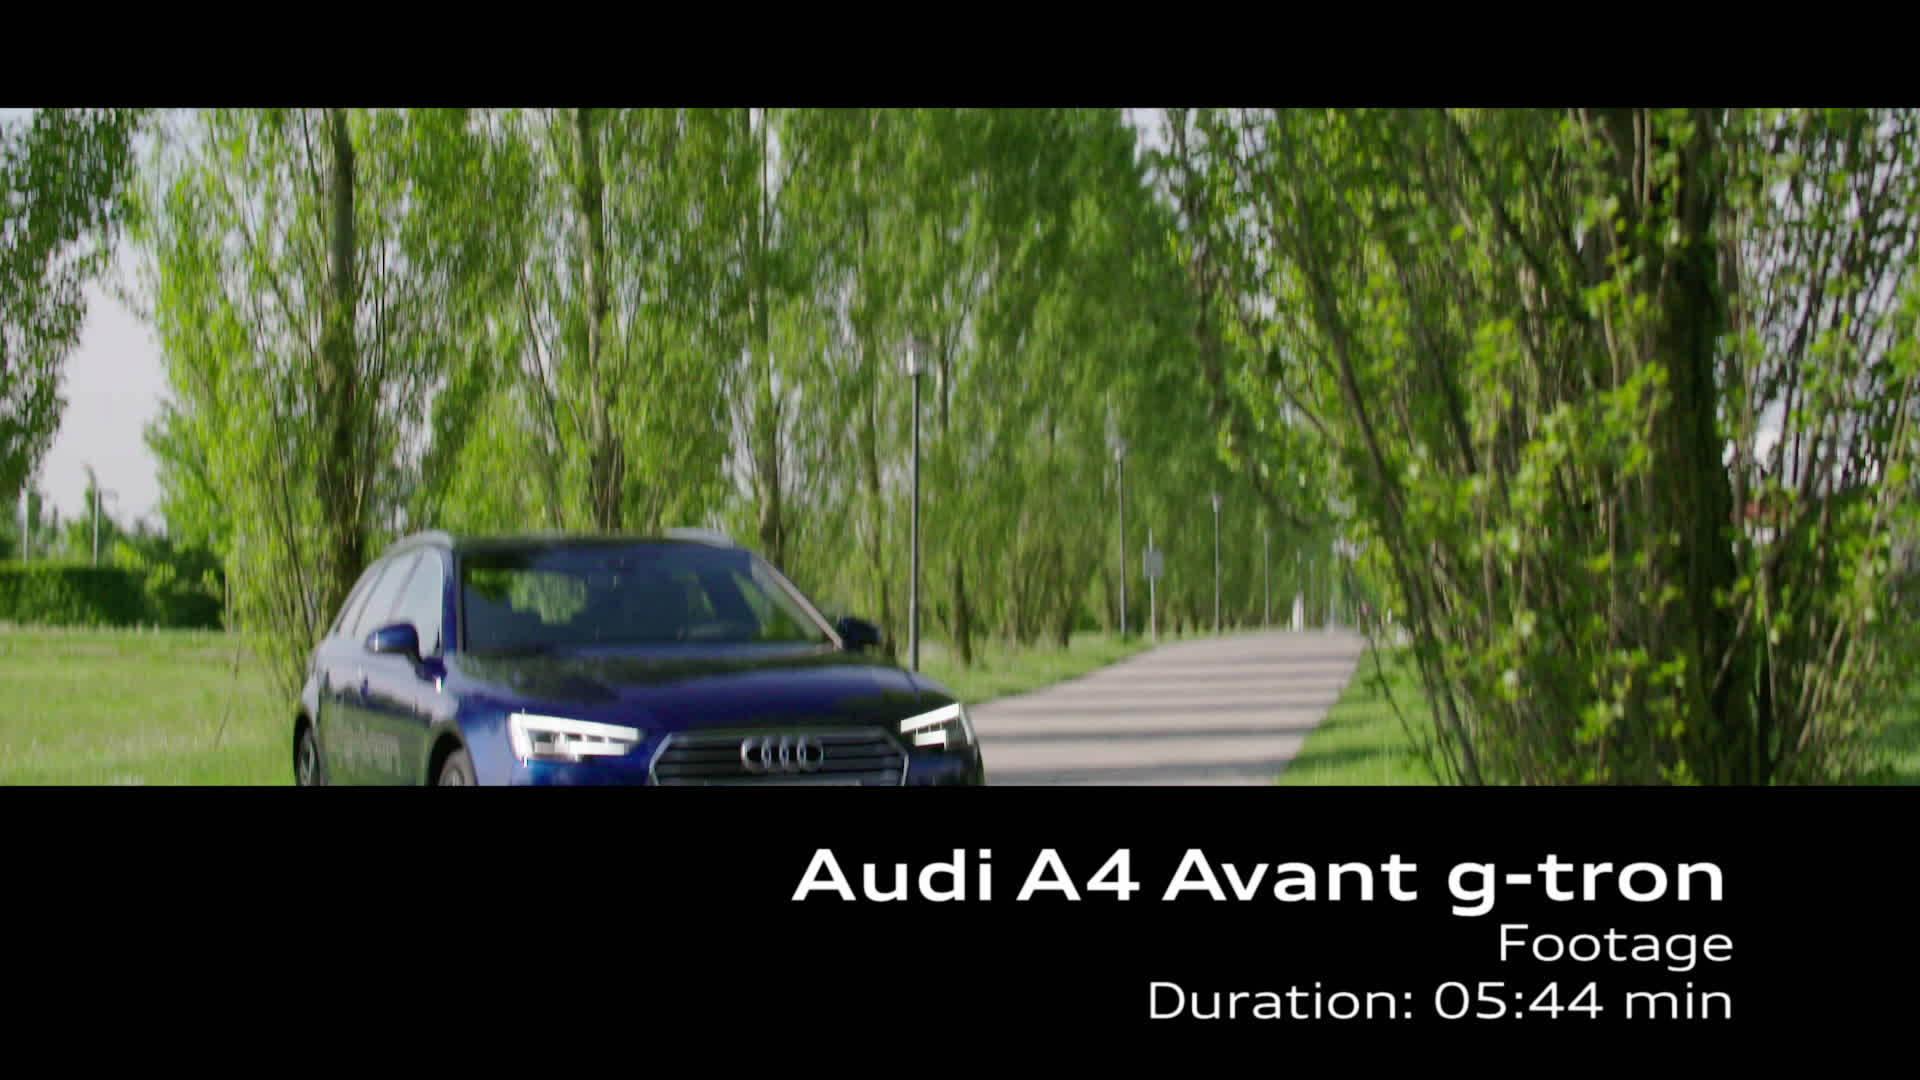 Audi A4 Avant g-tron (2017) – Footage TechDay